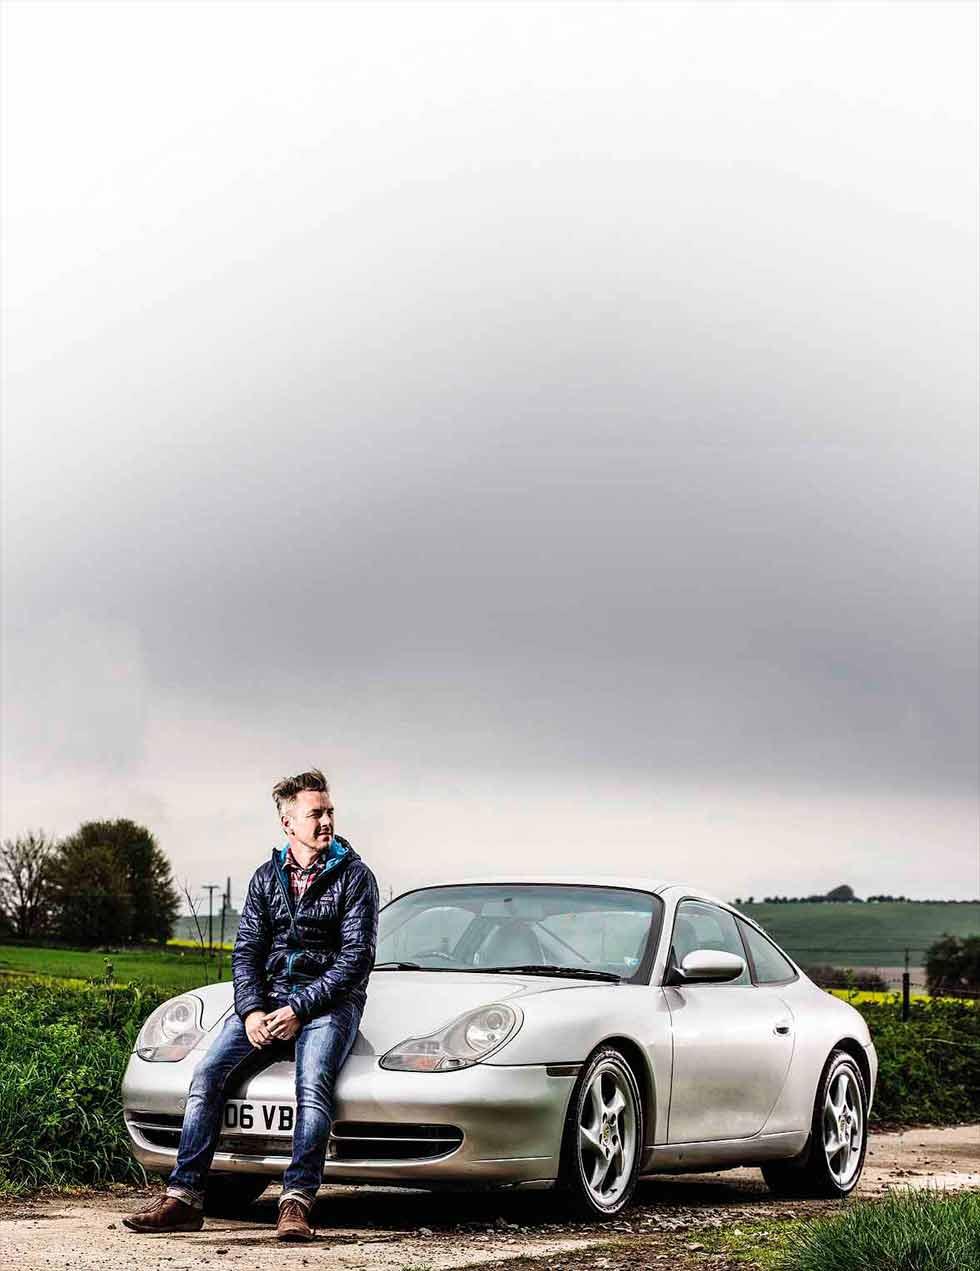 143,000-mile Porsche 911 996 C4